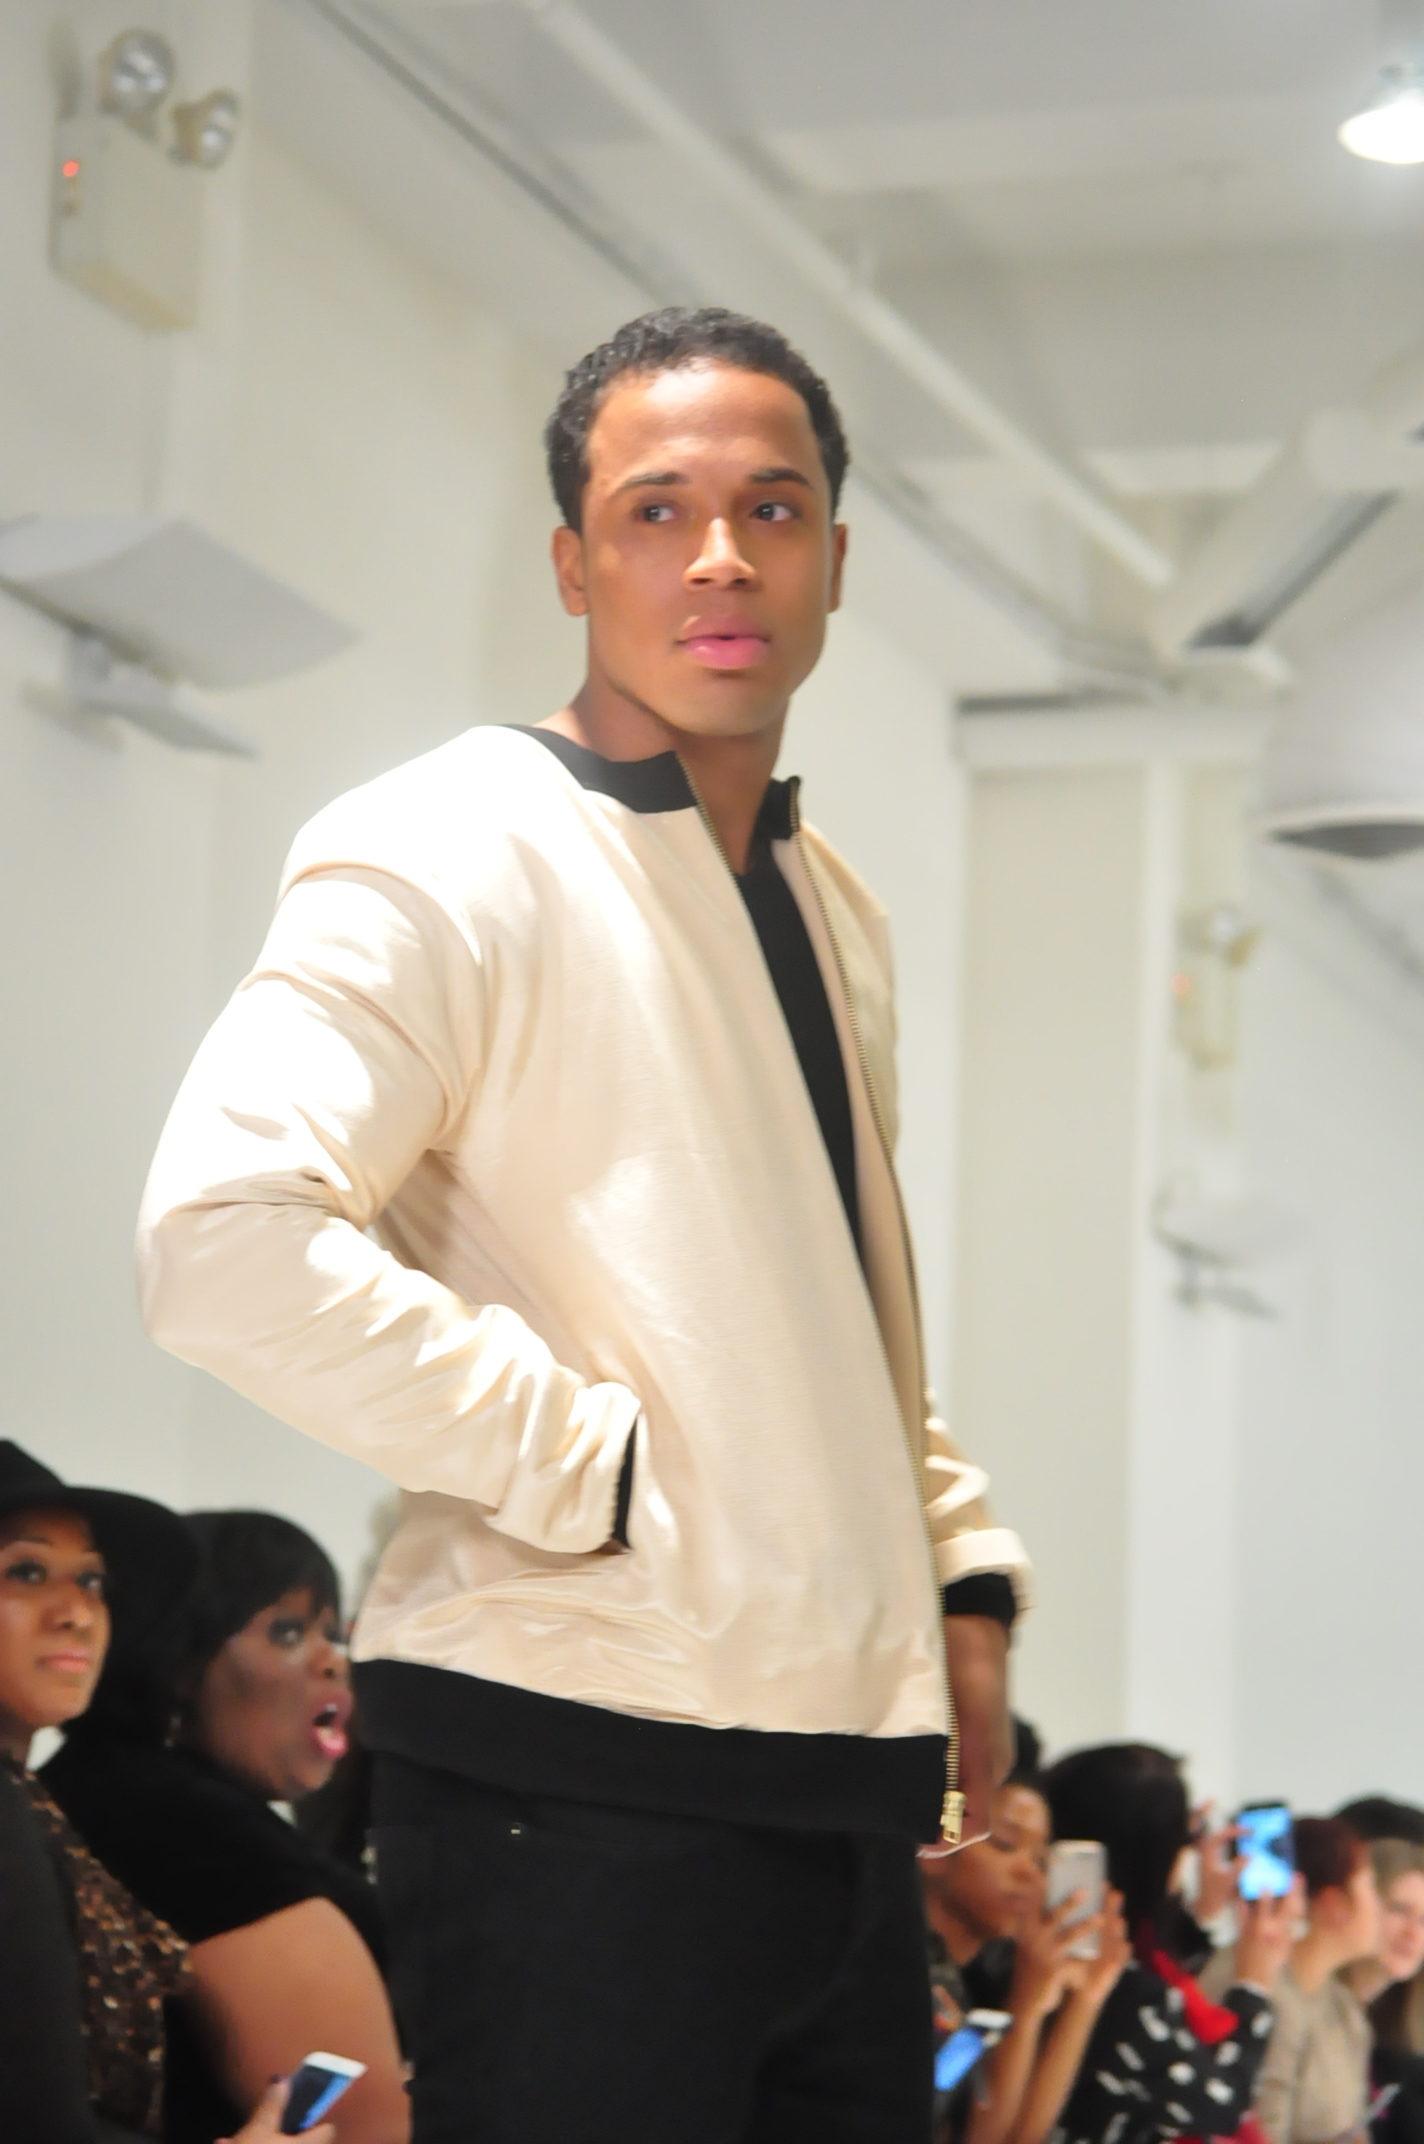 Prosper Fashion